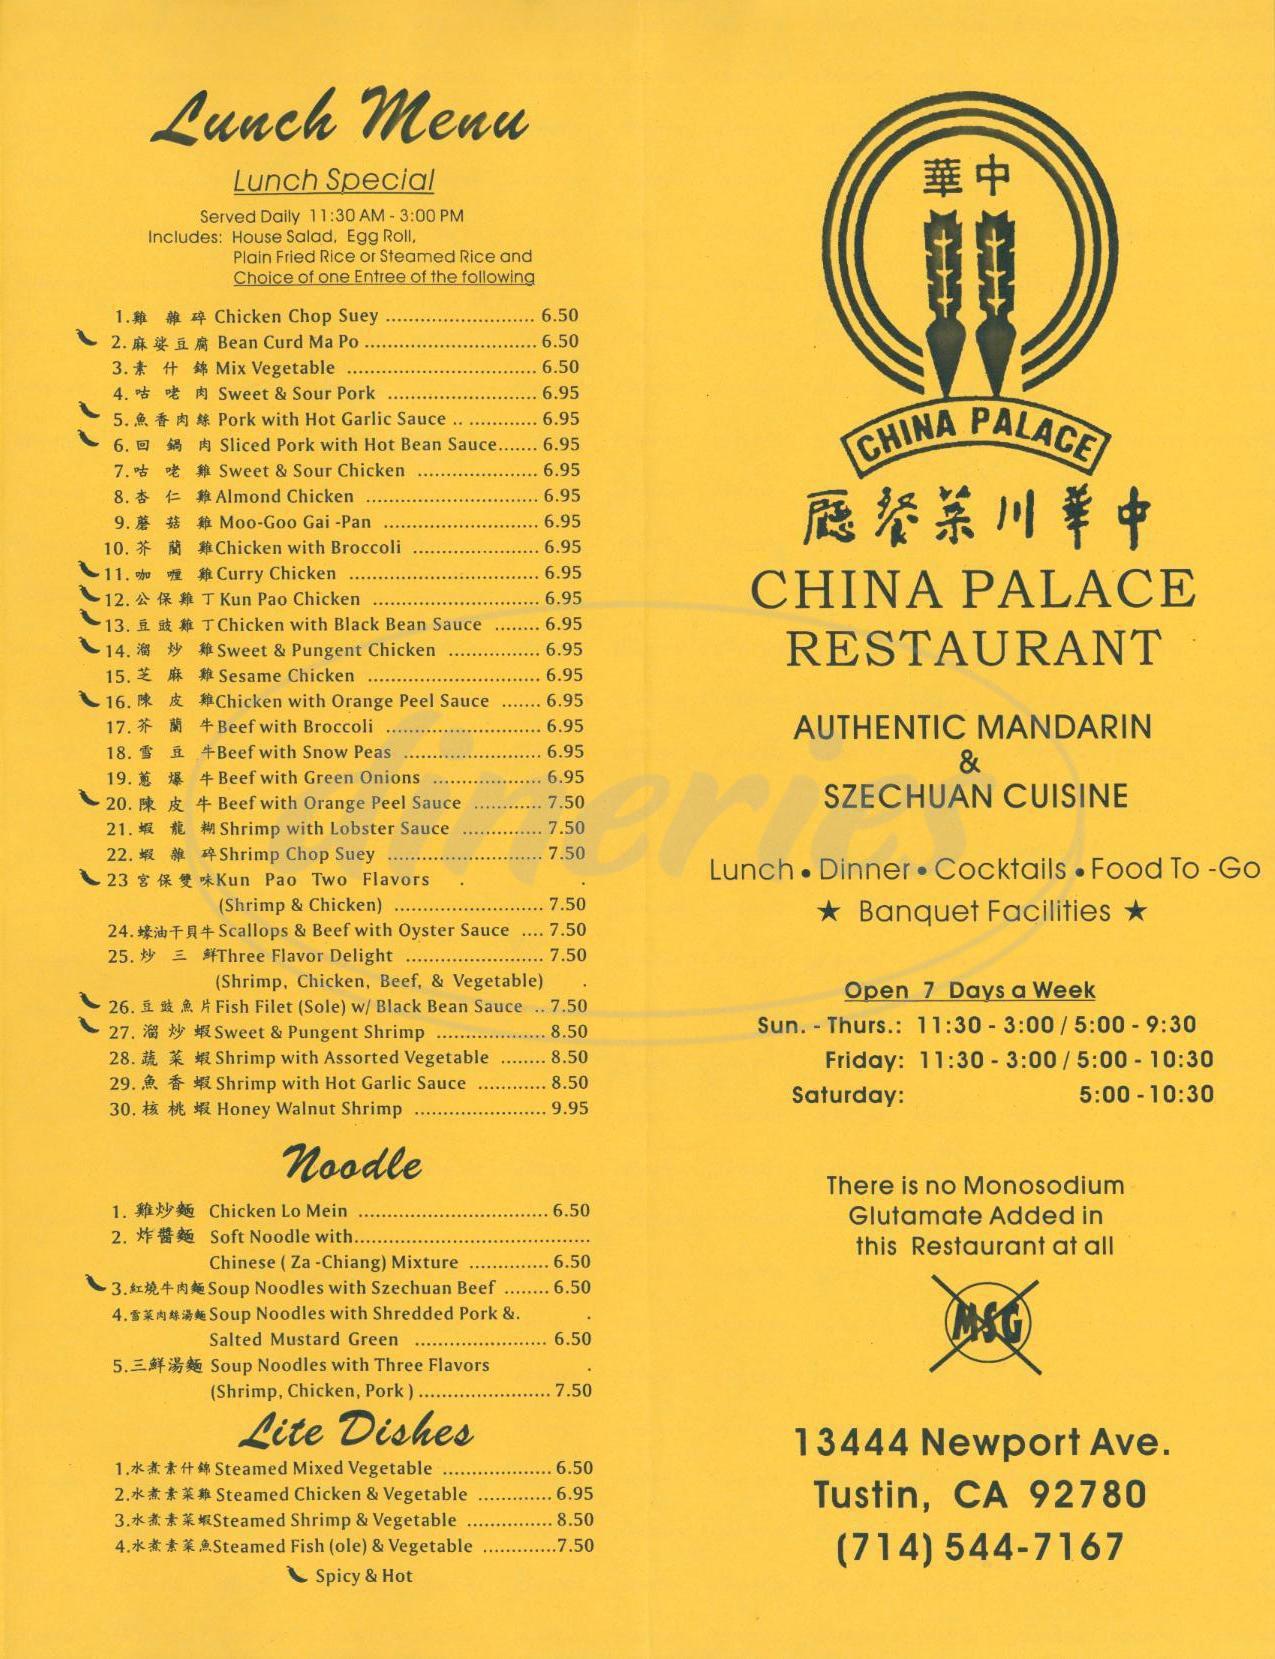 menu for China Palace Restaurant